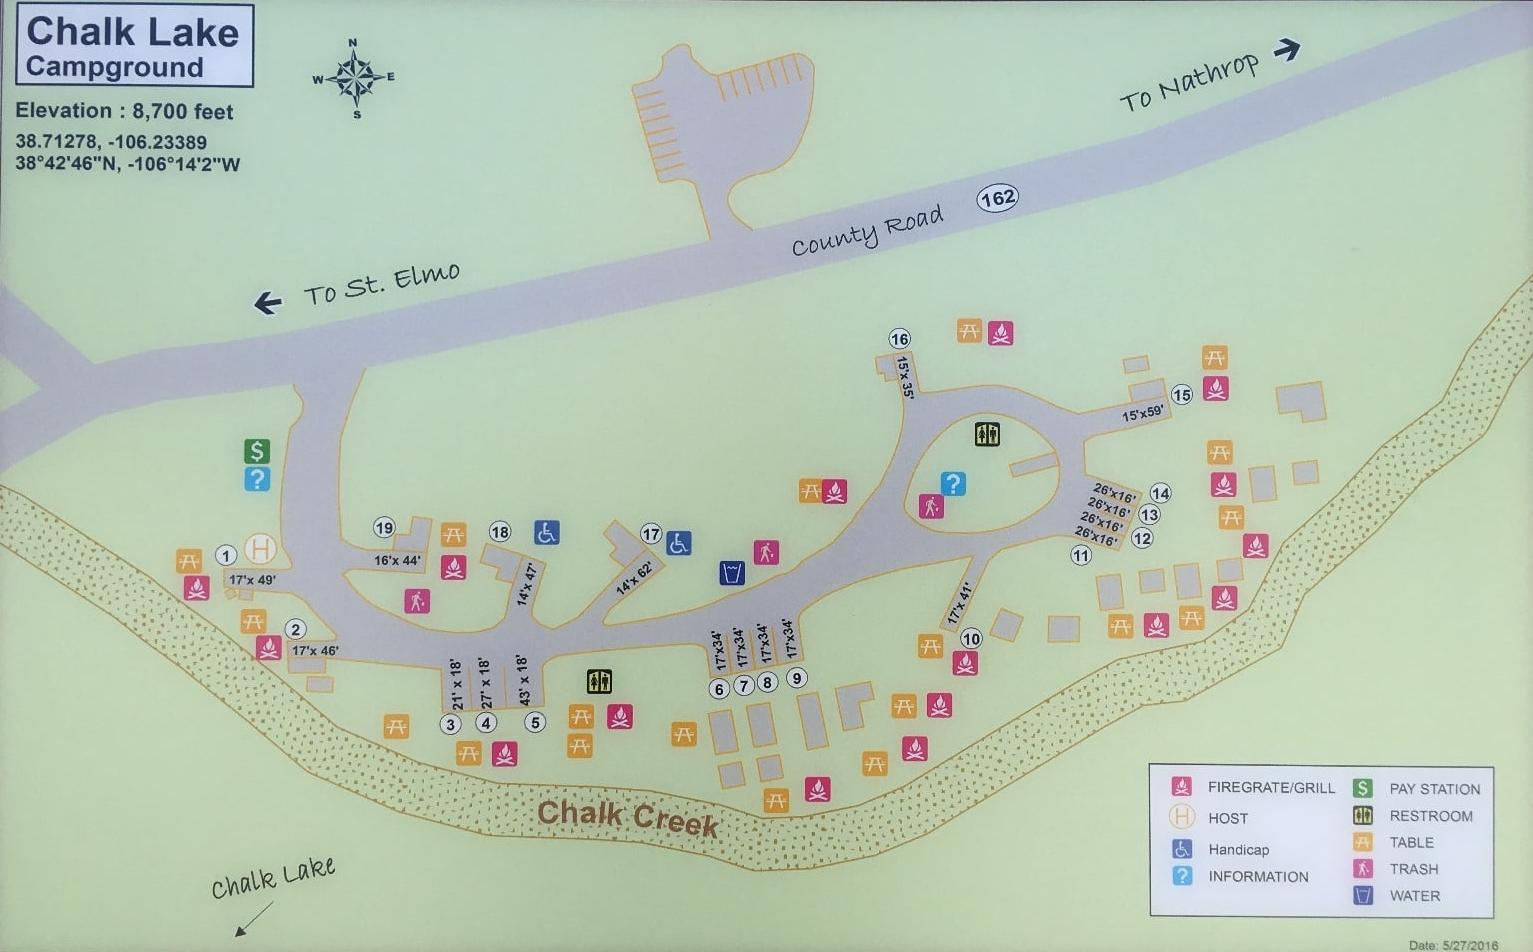 Chalk Lake Campground Map - Chaffee County colorado